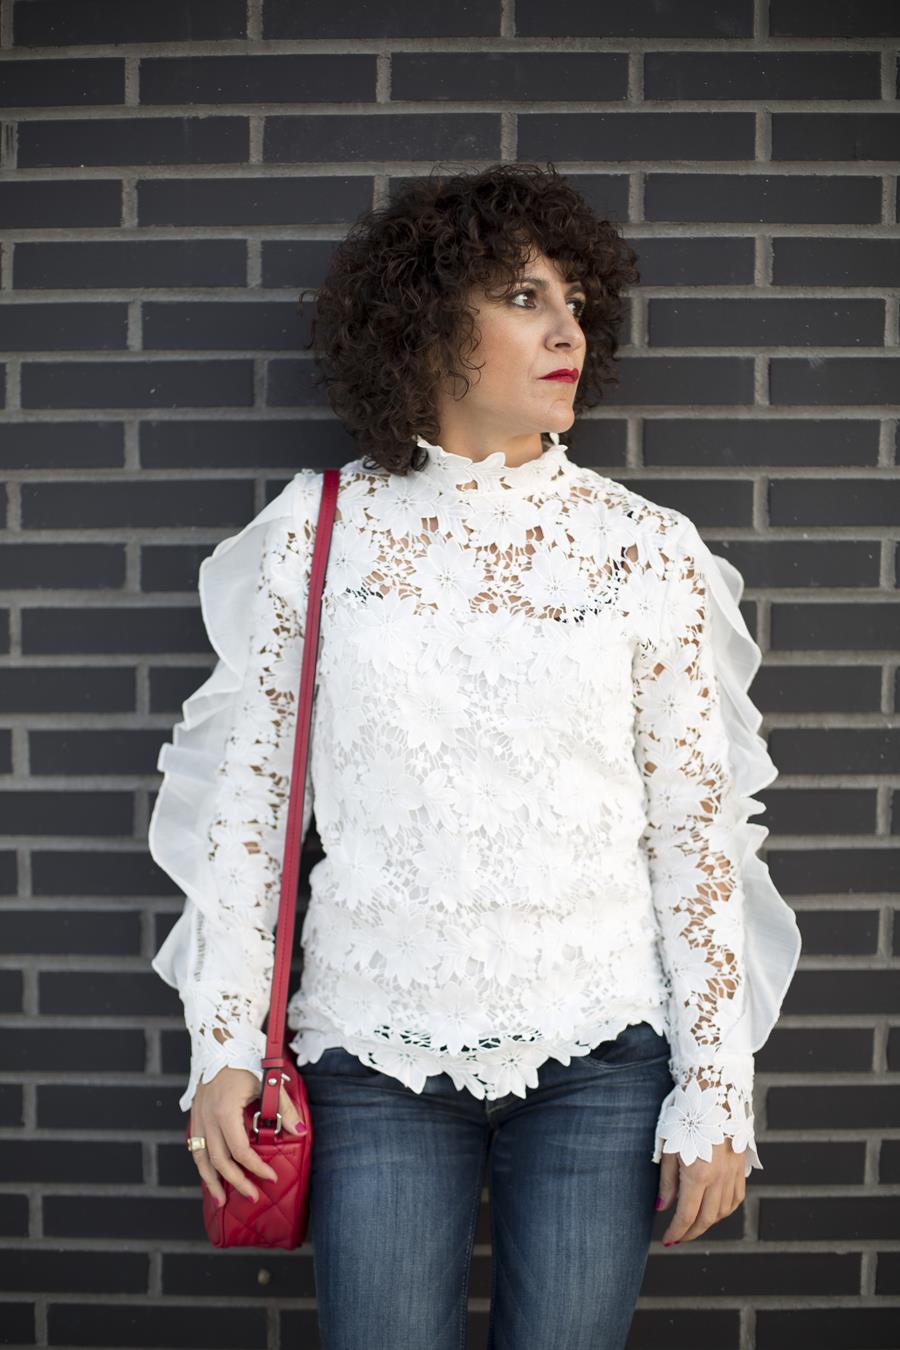 Rebeca Valdivia, personal shopper, estilista, stilist, Donostia, San Sebastián, Miss Clov, curls, rizos, bell jeans, pantalón de campana, camisa encaje, guipur, camisa blanca, white shirt, peep toe, bag, bolso bandolera